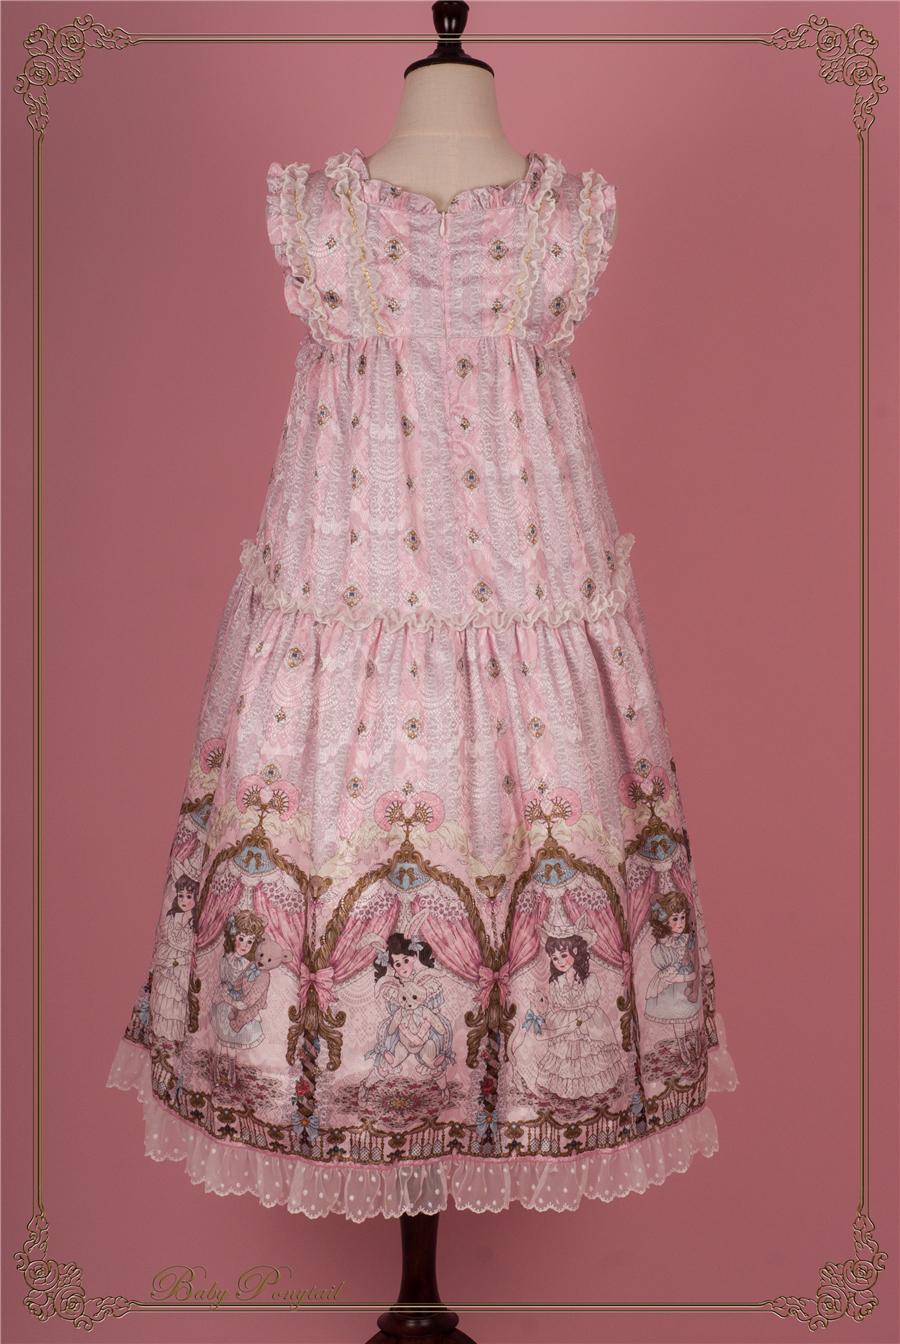 BabyPonytail_Stock Photo_My Favorite Companion_JSK Baby Doll Pink_07.jpg